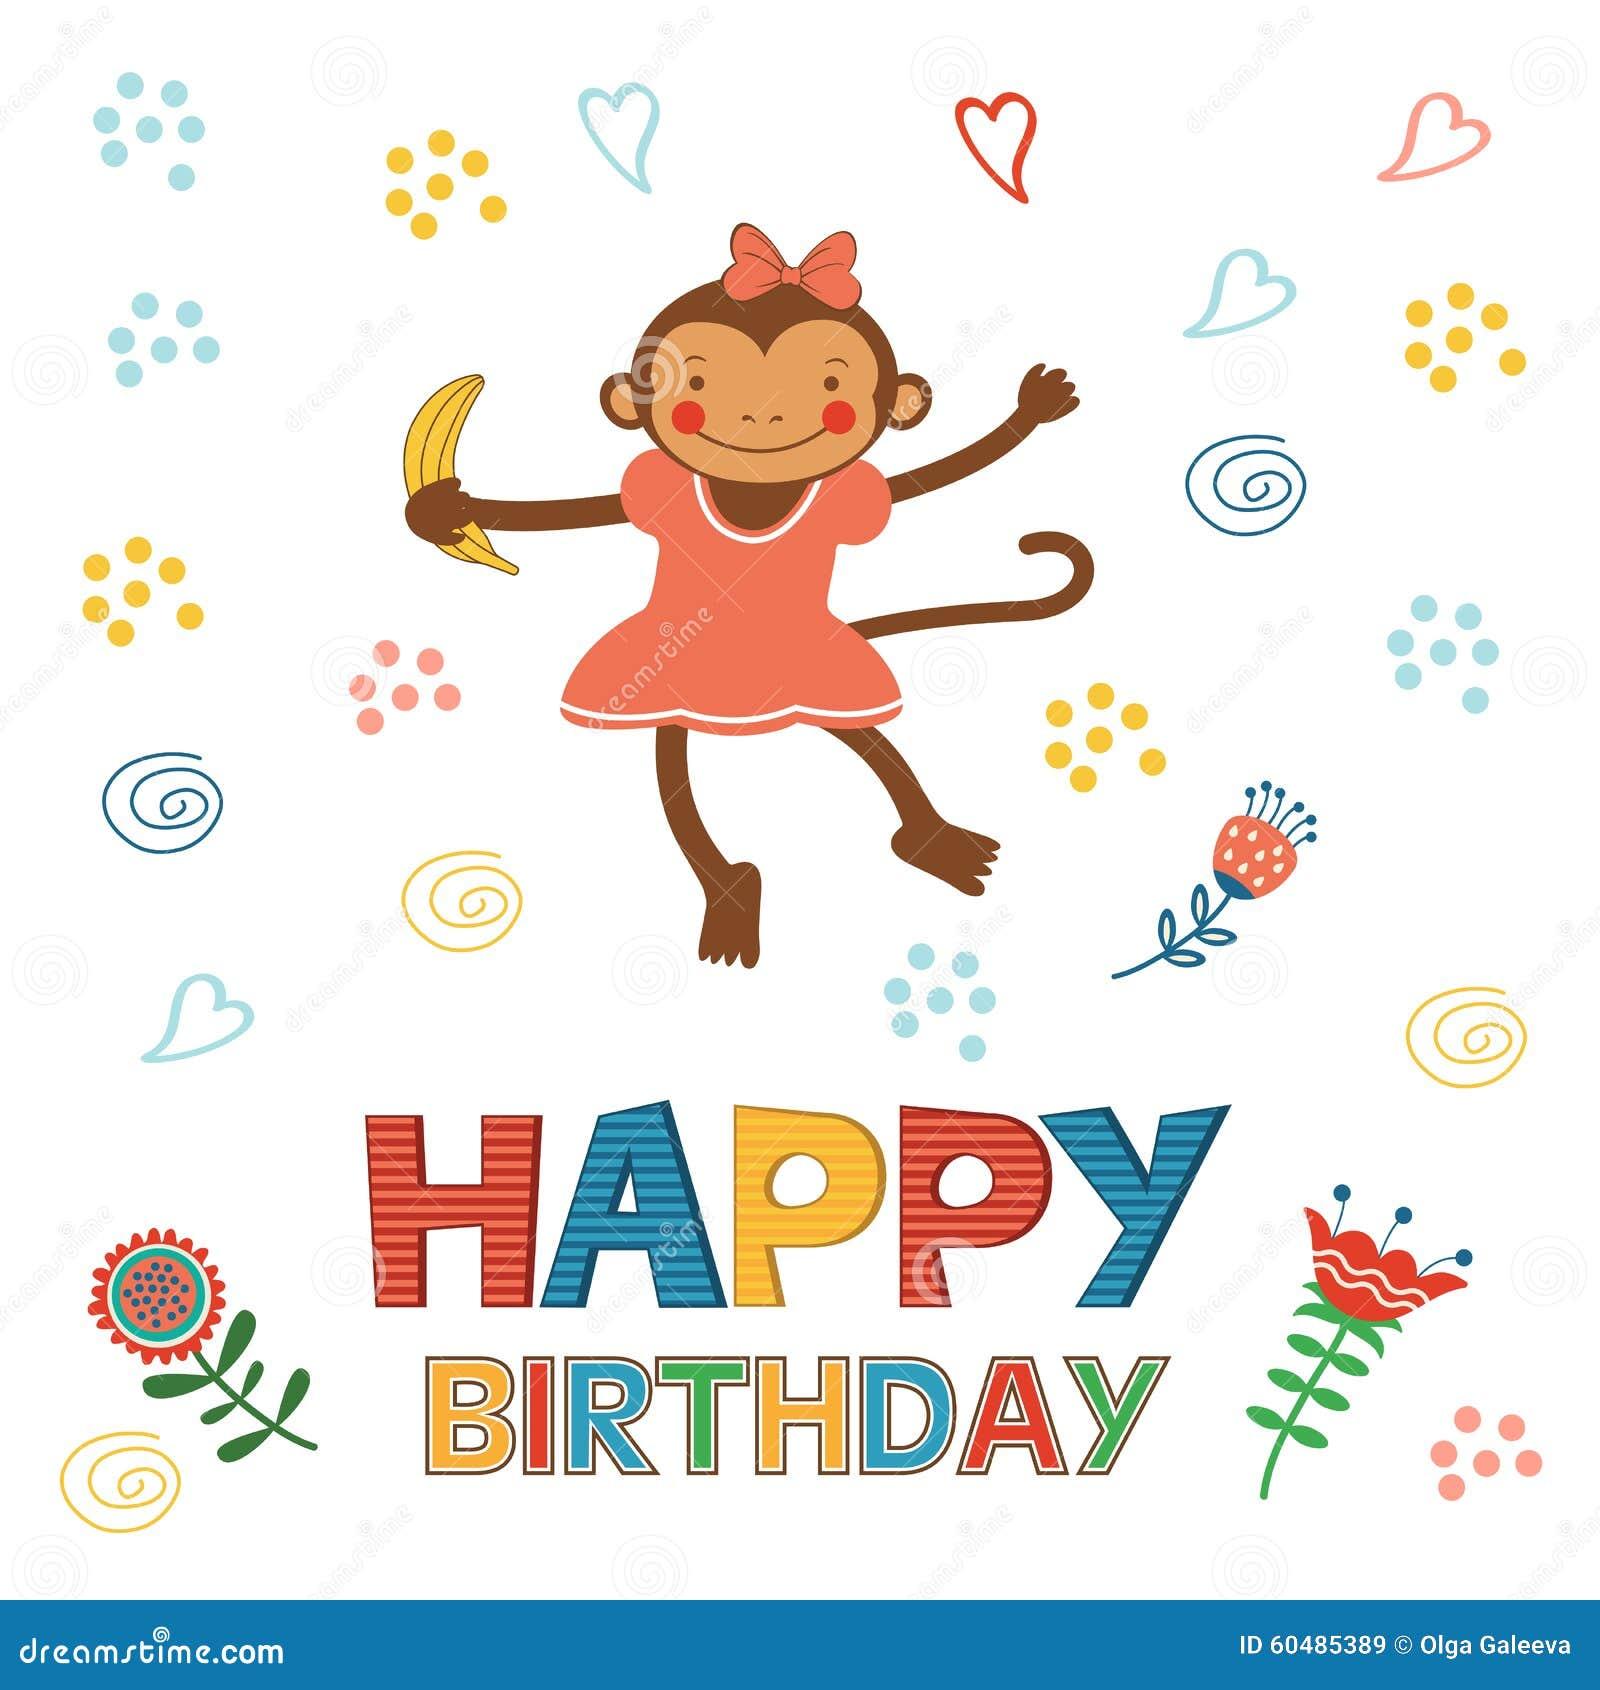 Happy birthday to you обезьяны открытка